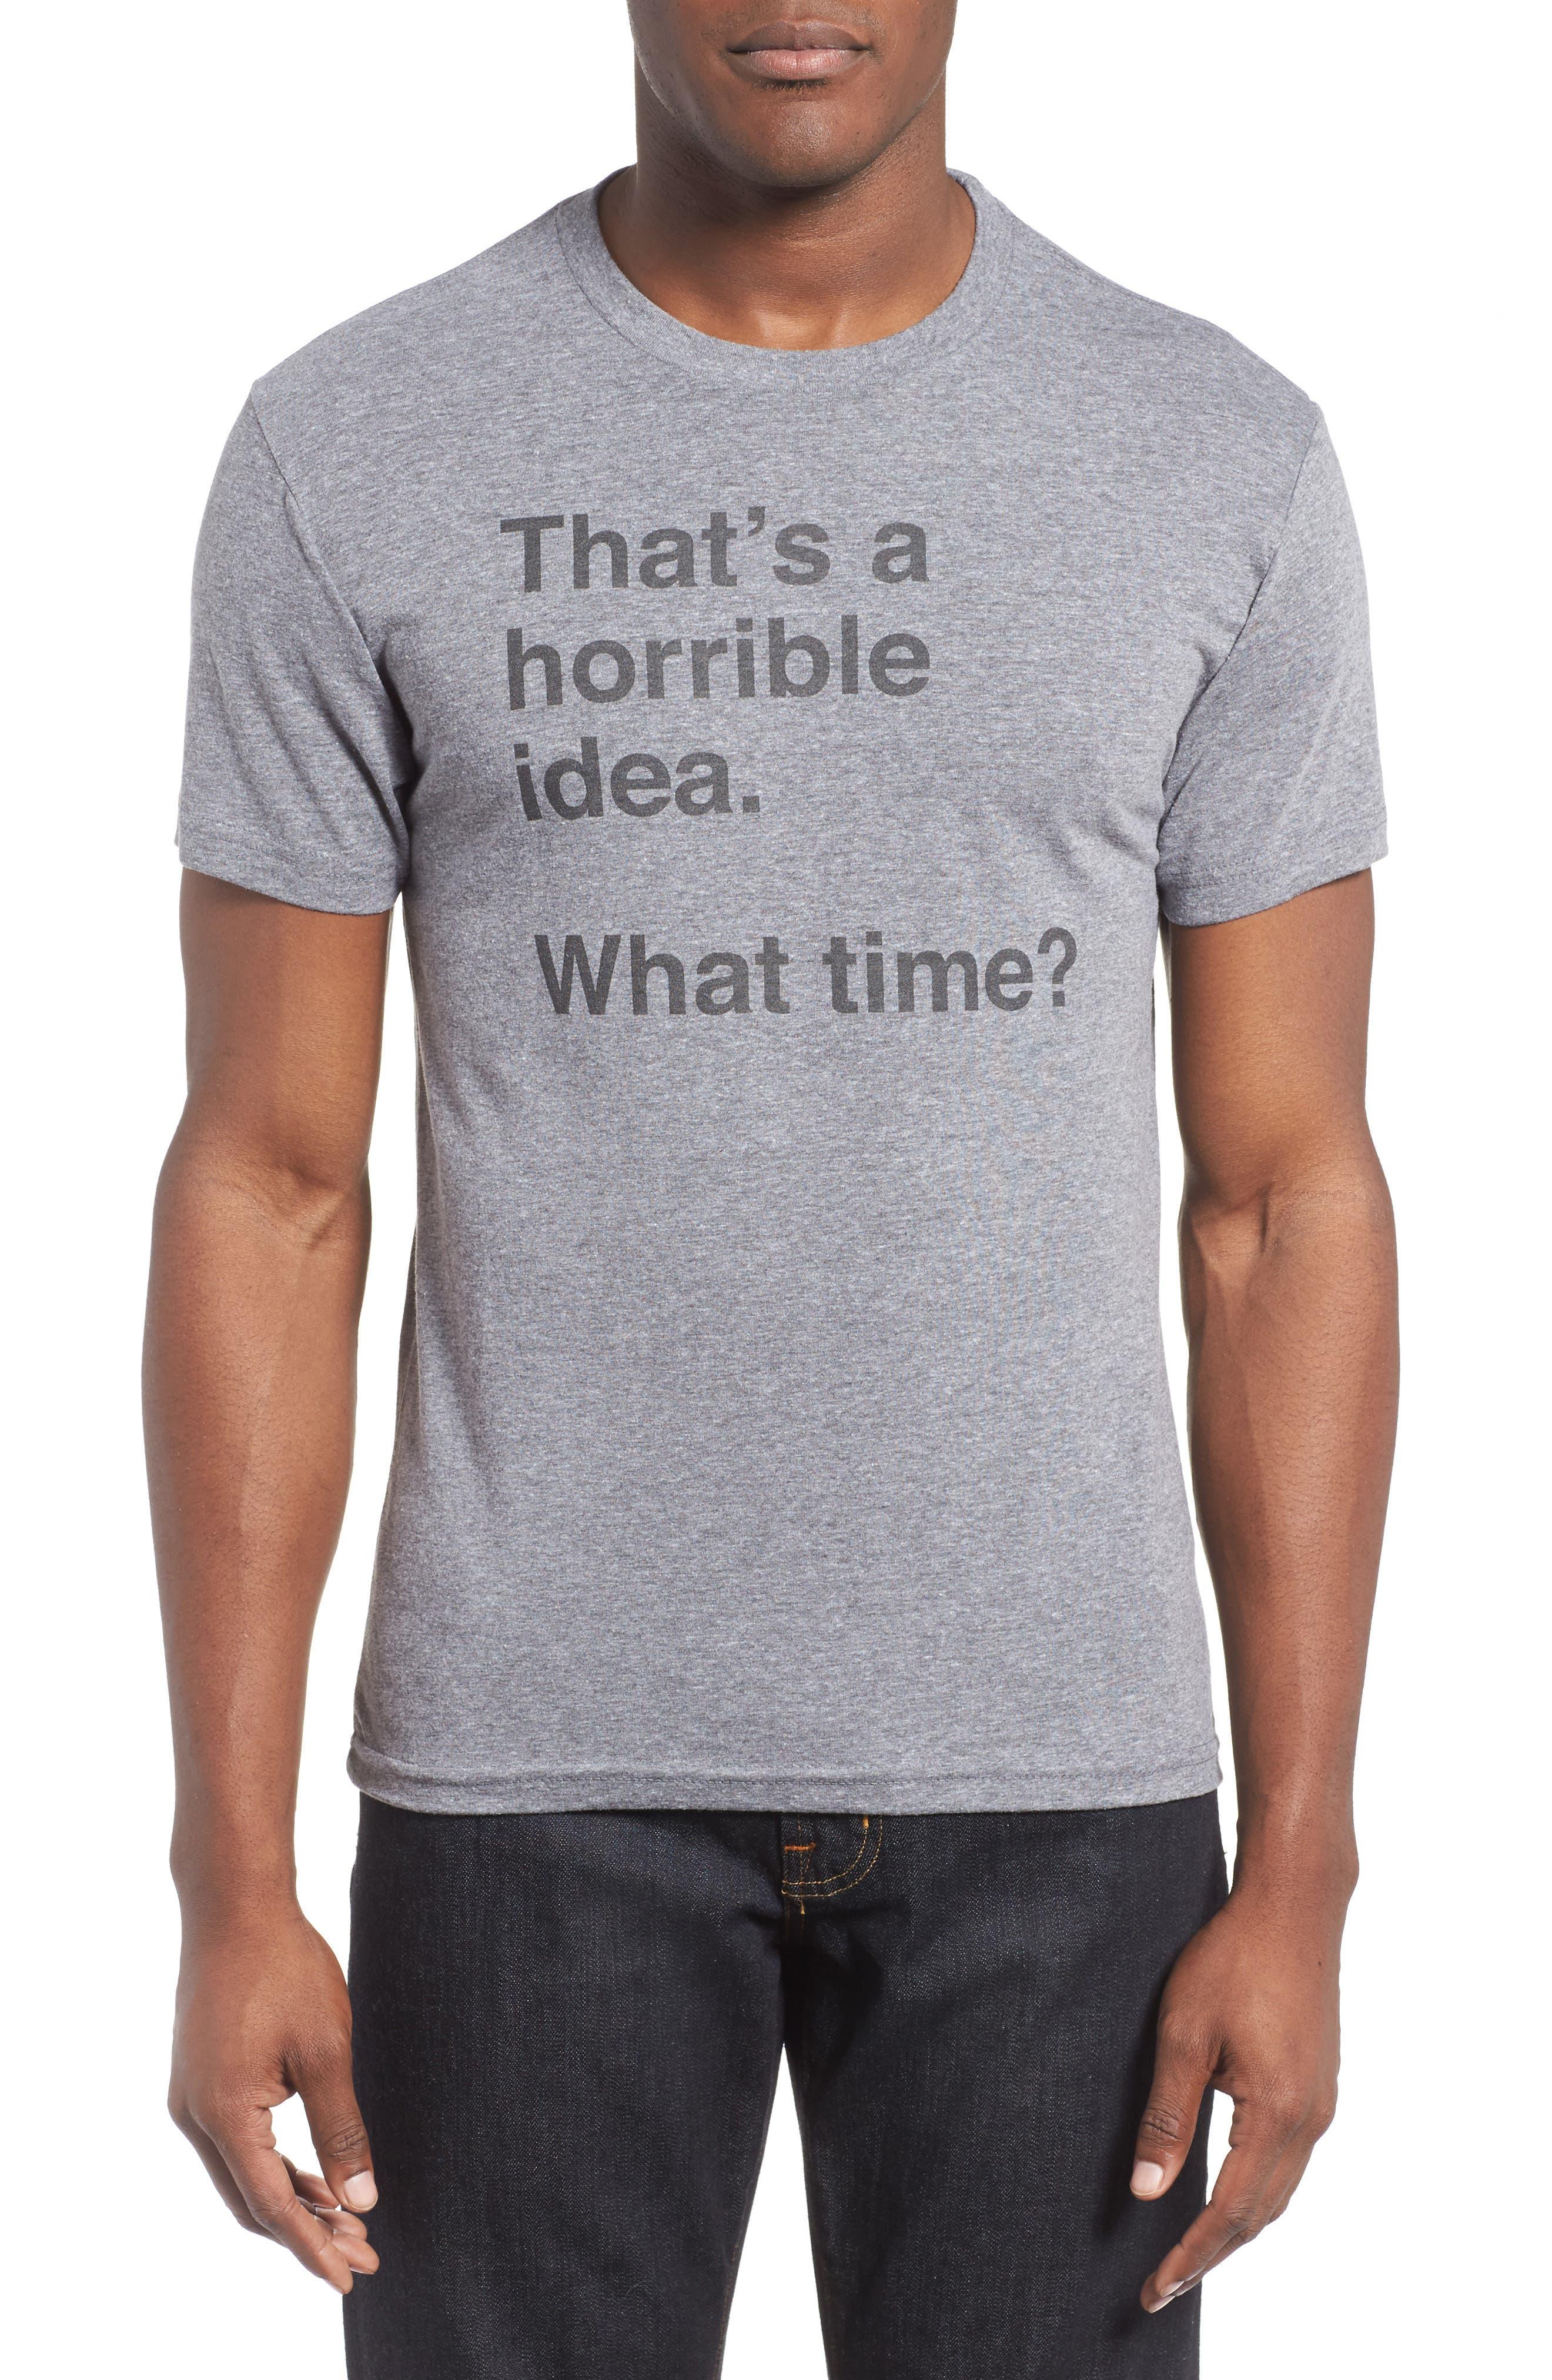 Alternate Image 1 Selected - Kid Dangerous Horrible Idea Graphic T-Shirt